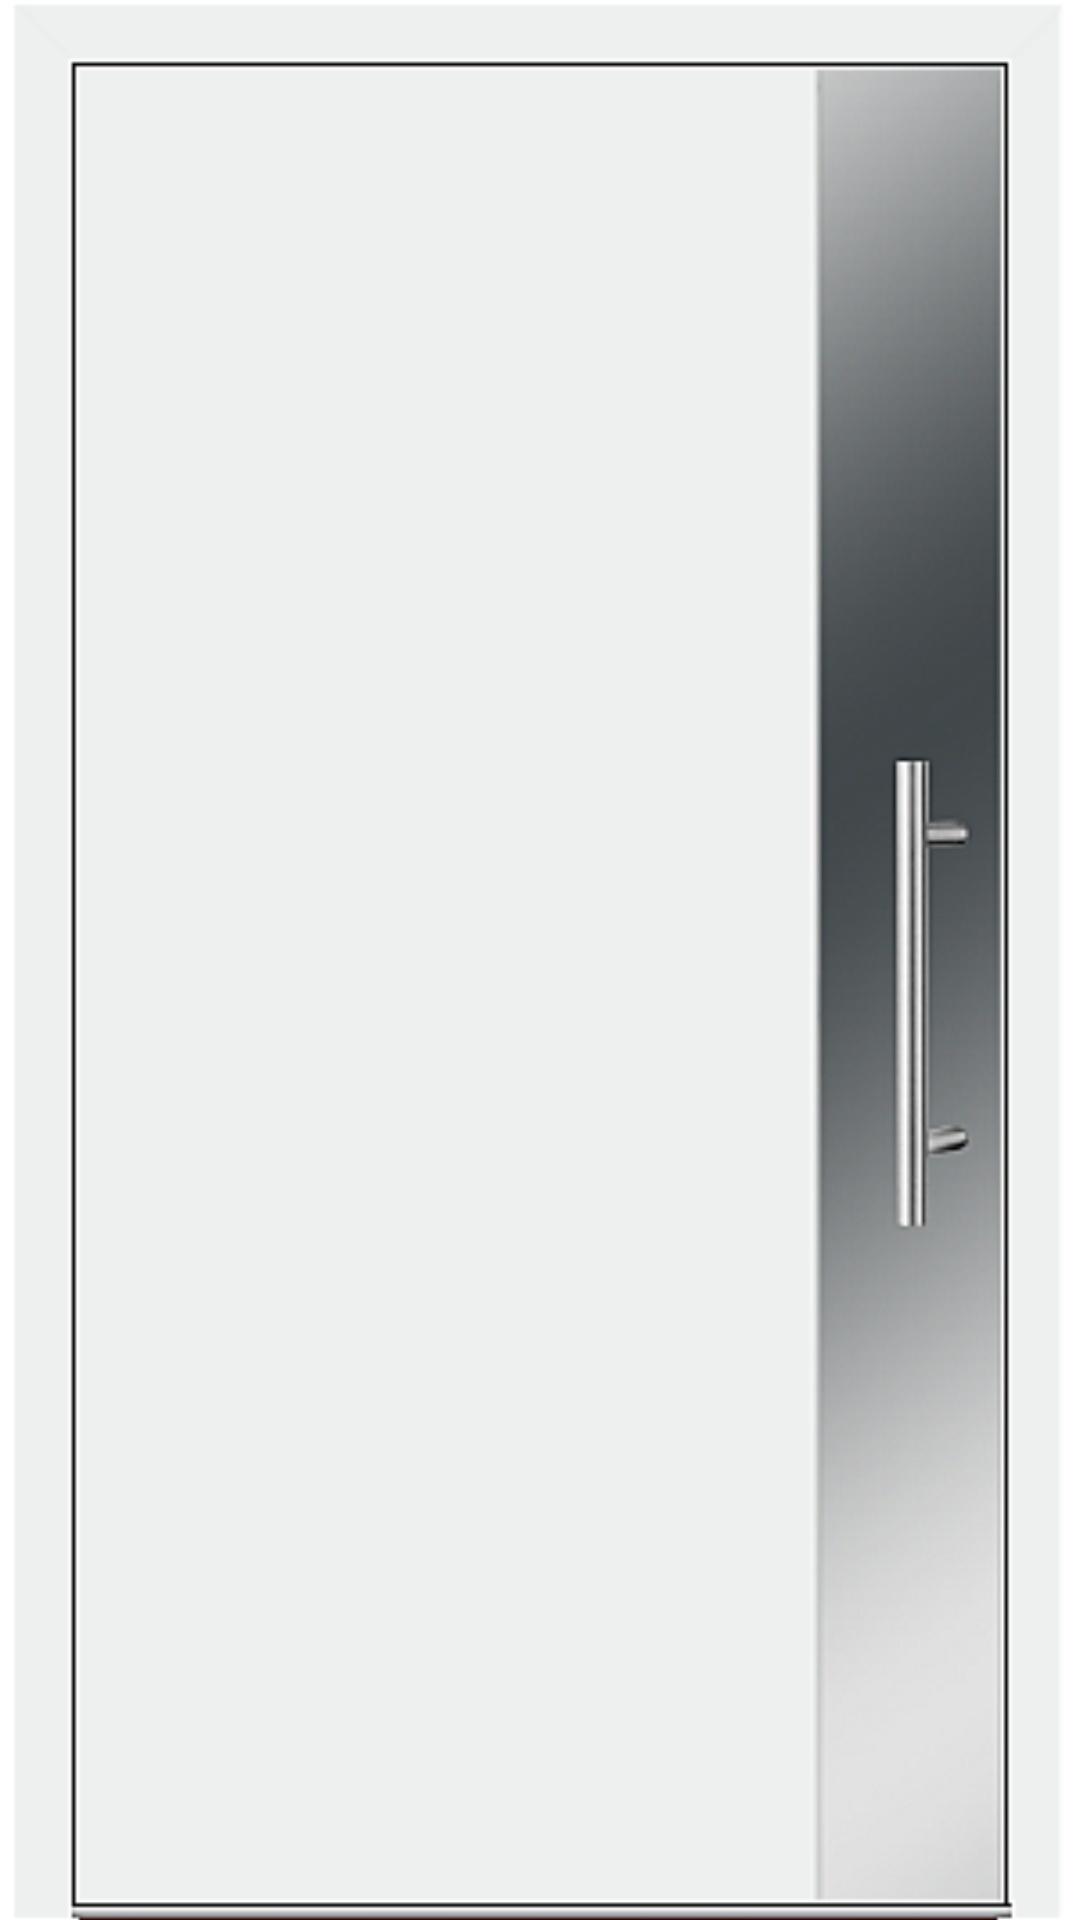 Aluminium Haustür Modell 6903-97 weiß